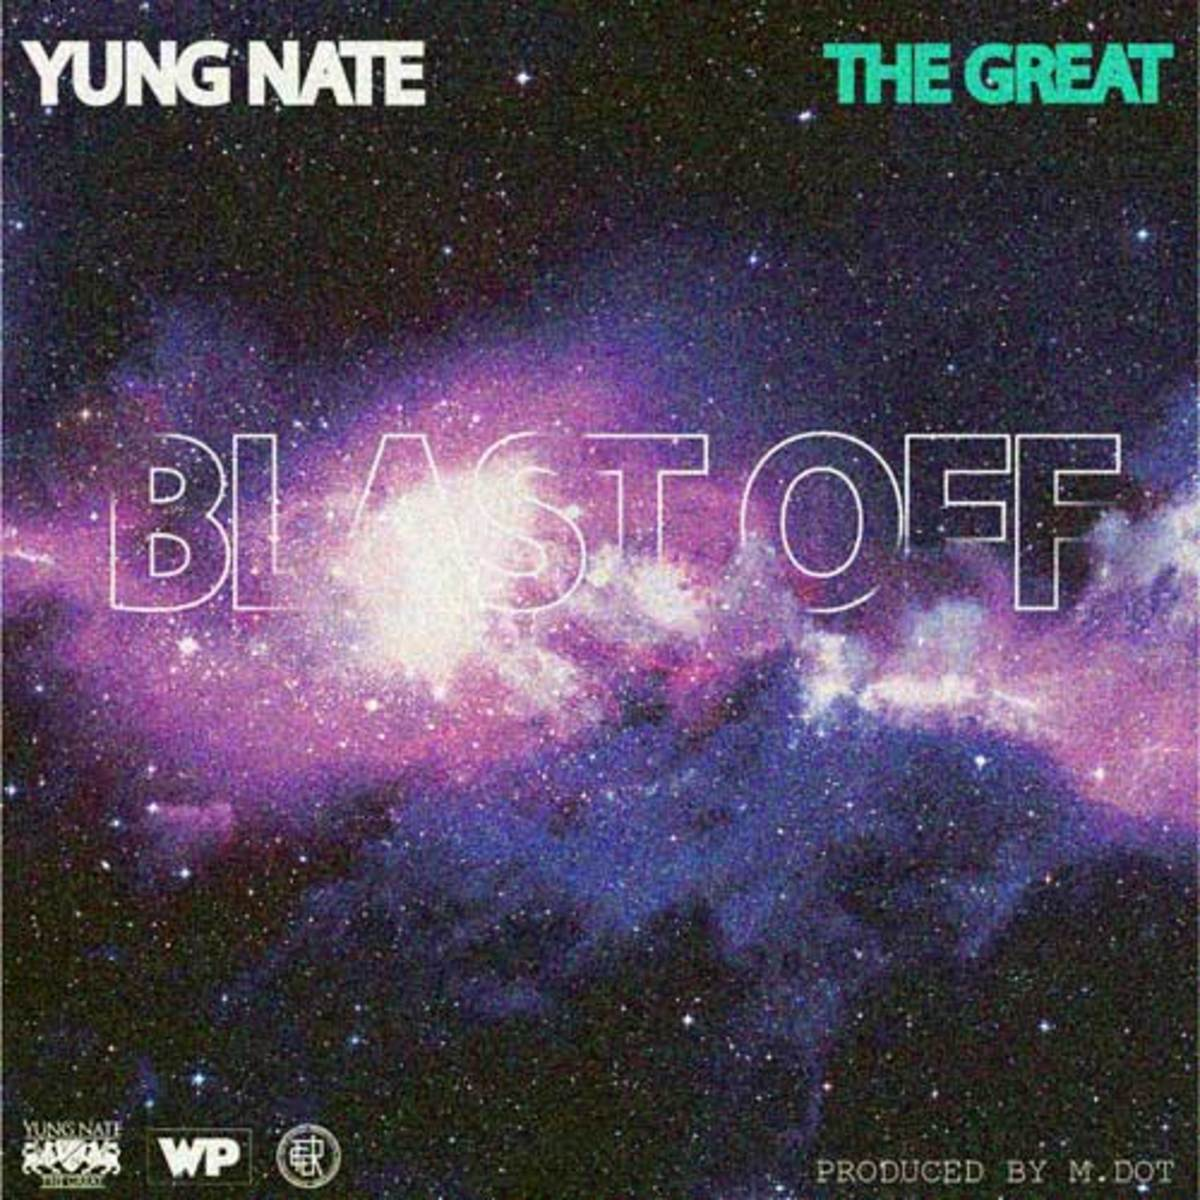 yungnate-blastoff.jpg